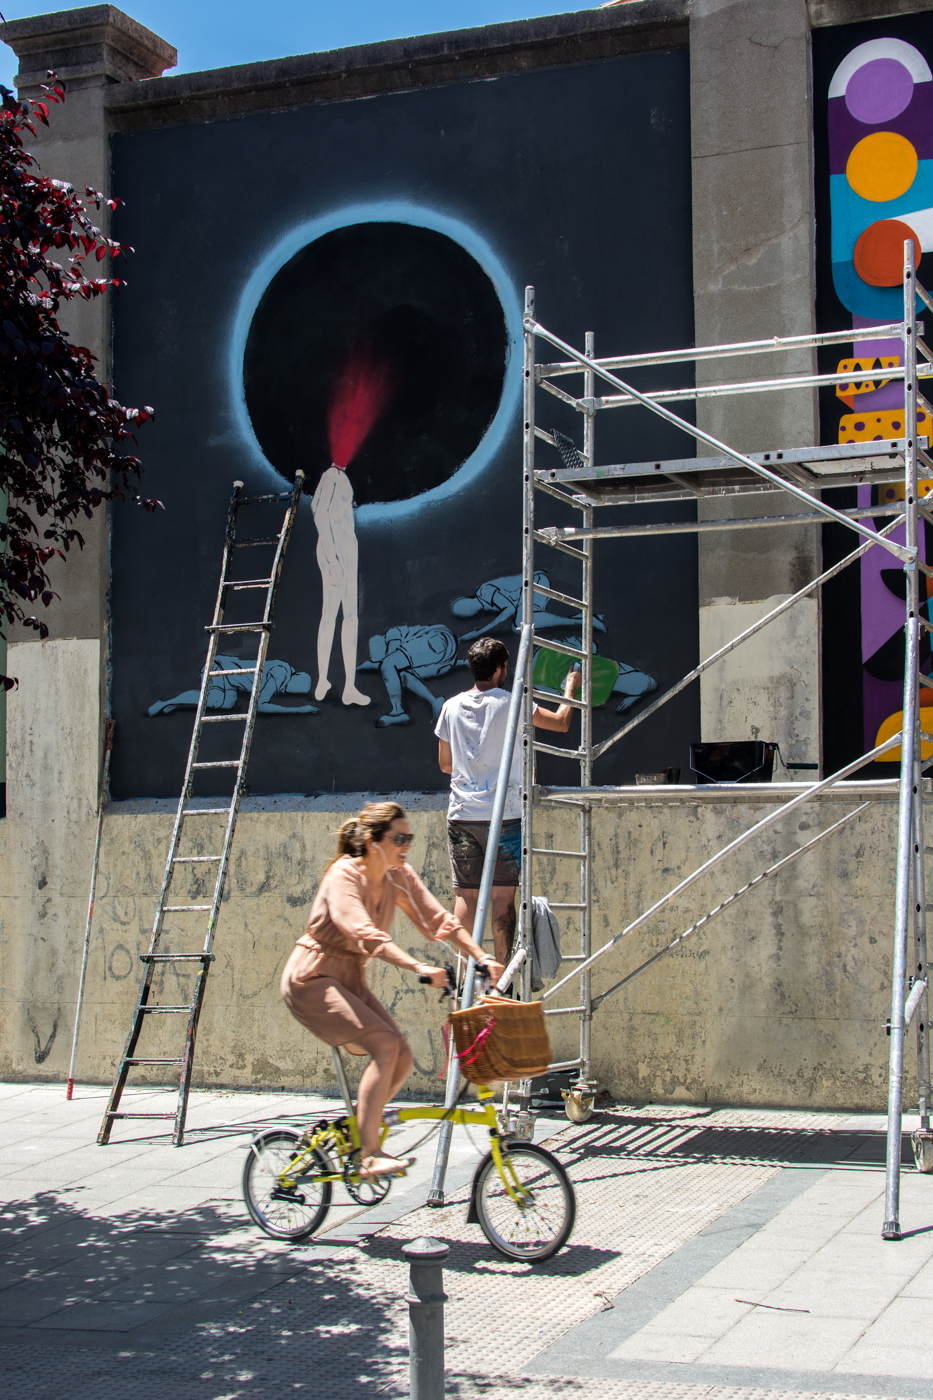 Dadi Dreucol proceso - MurosTabacalera by Guillermo de la Madrid - Madrid Street Art Project -24.jpg